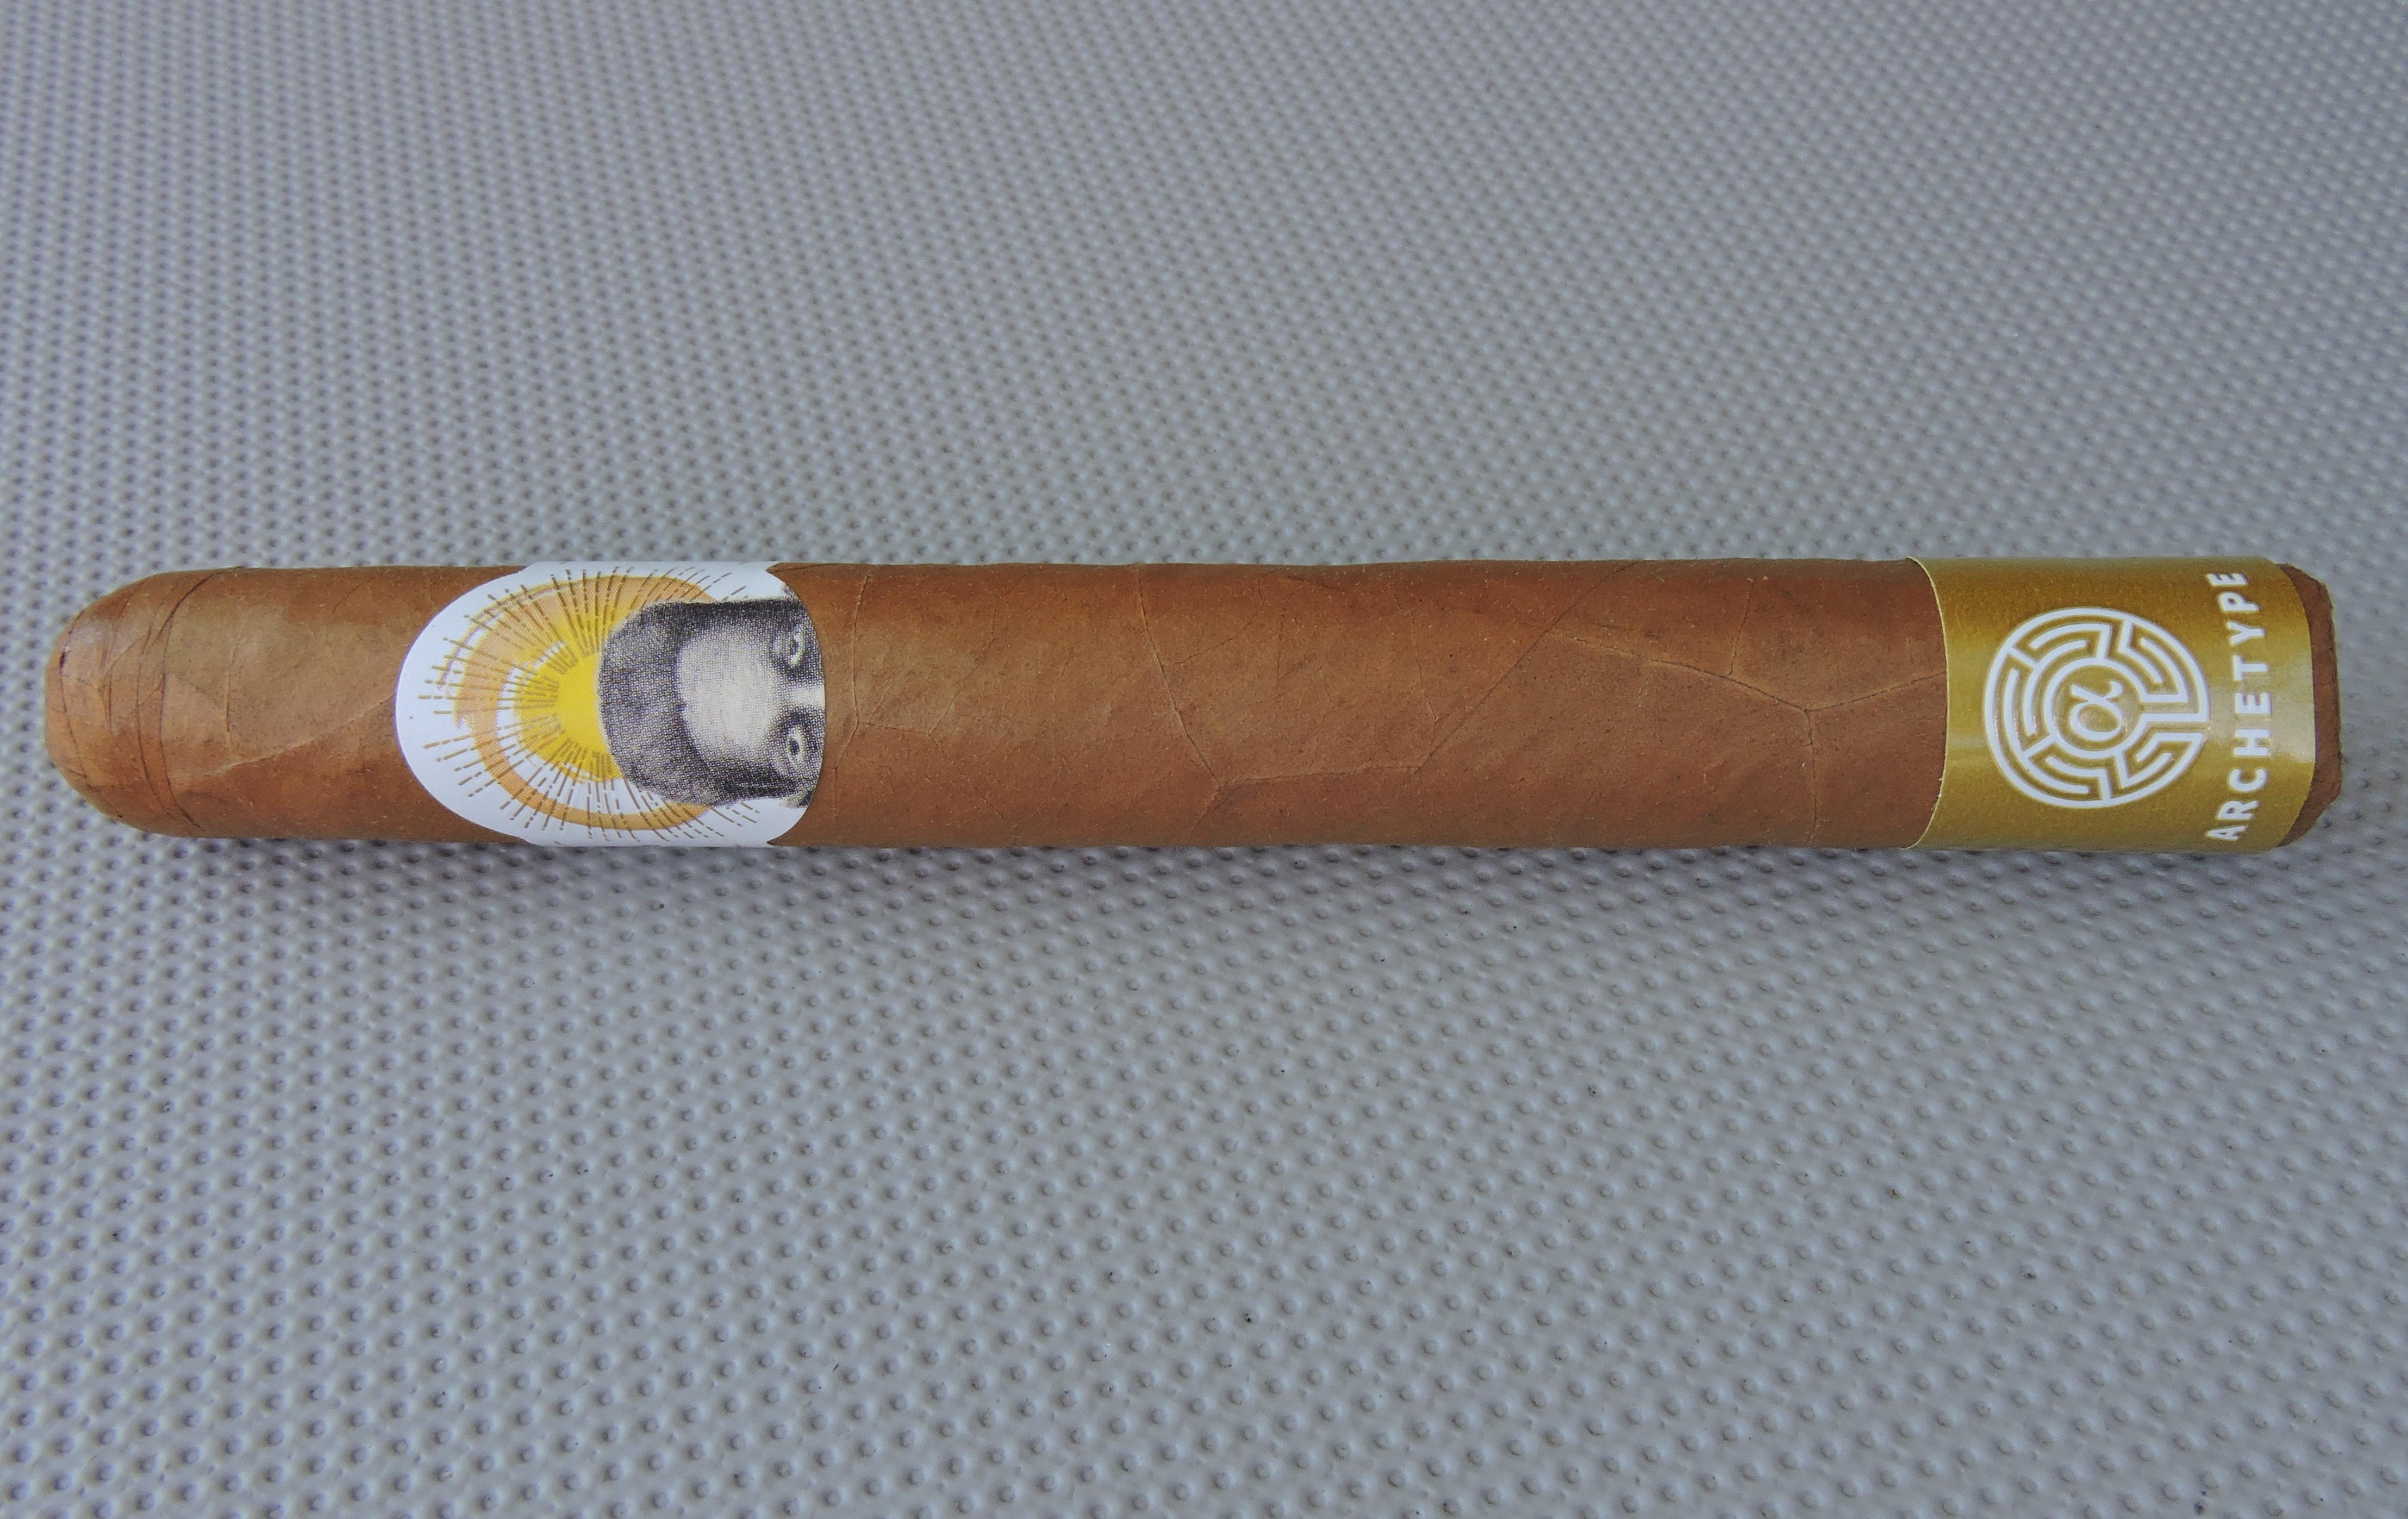 Cigar Review: Archetype Dreamstate Toro by Ventura Cigar Company